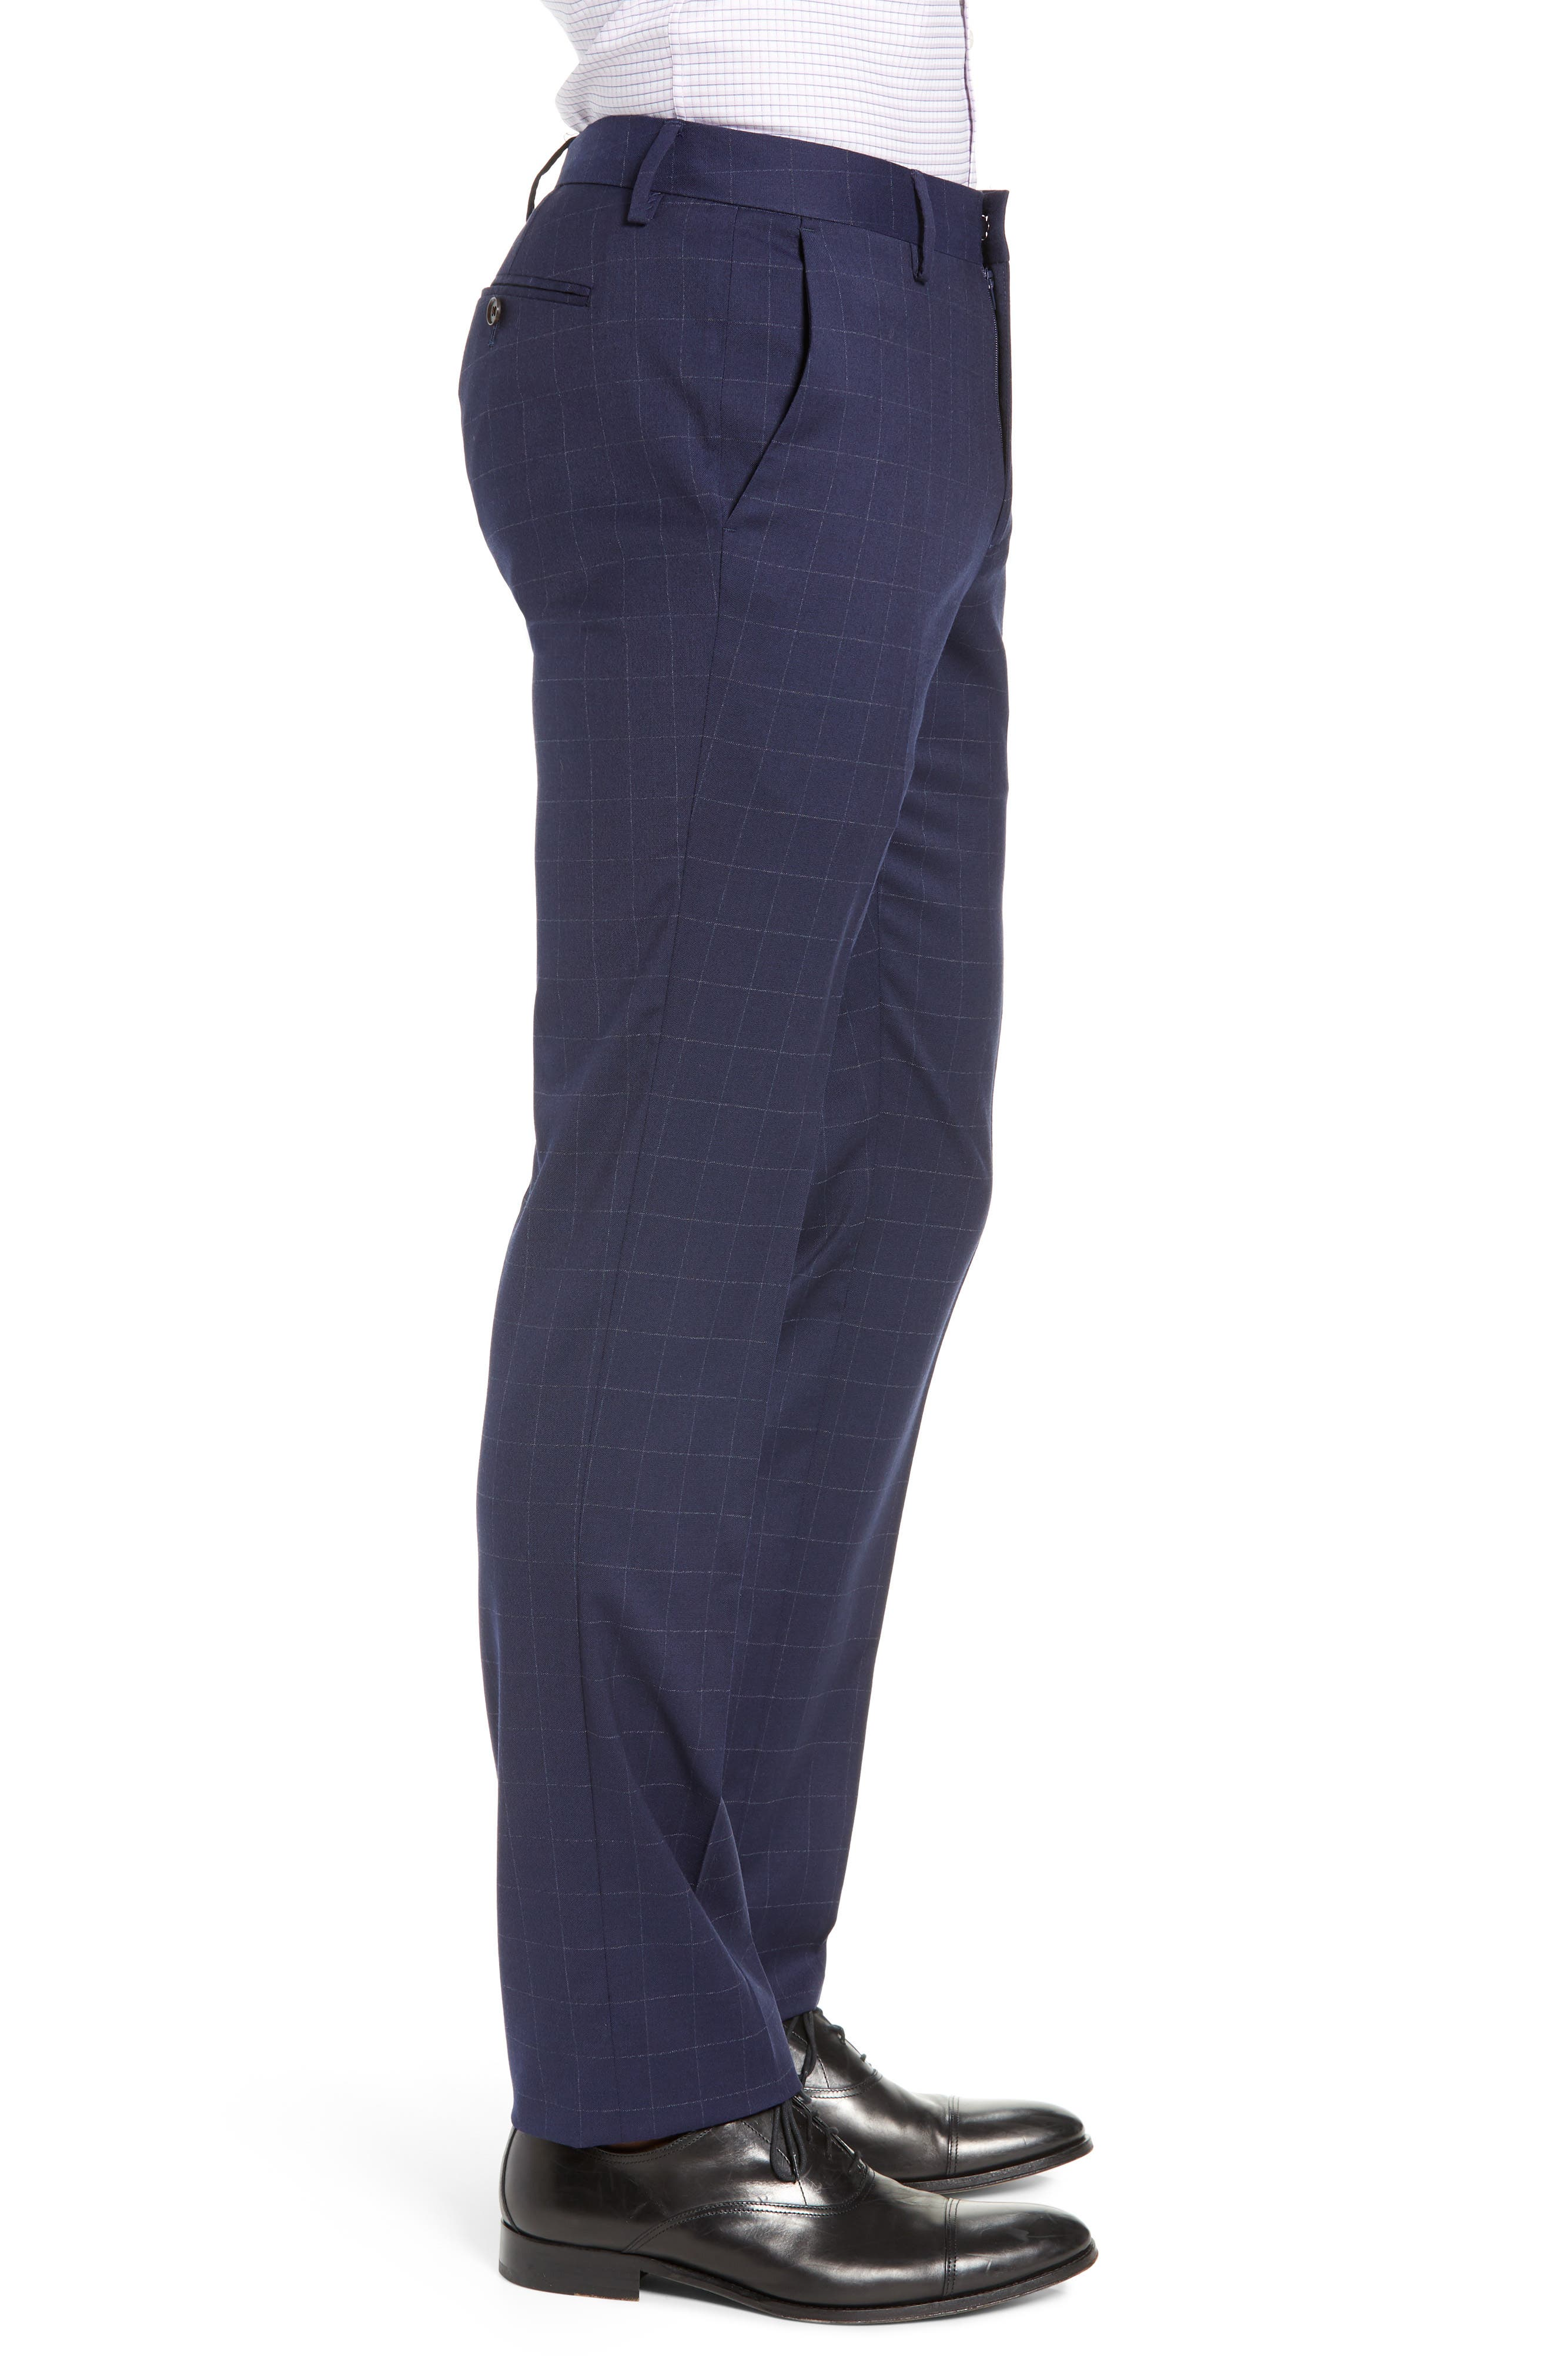 Jetsetter Slim Fit Stretch Suit Pants,                             Alternate thumbnail 3, color,                             NAVY CHALK WINDOWPANE